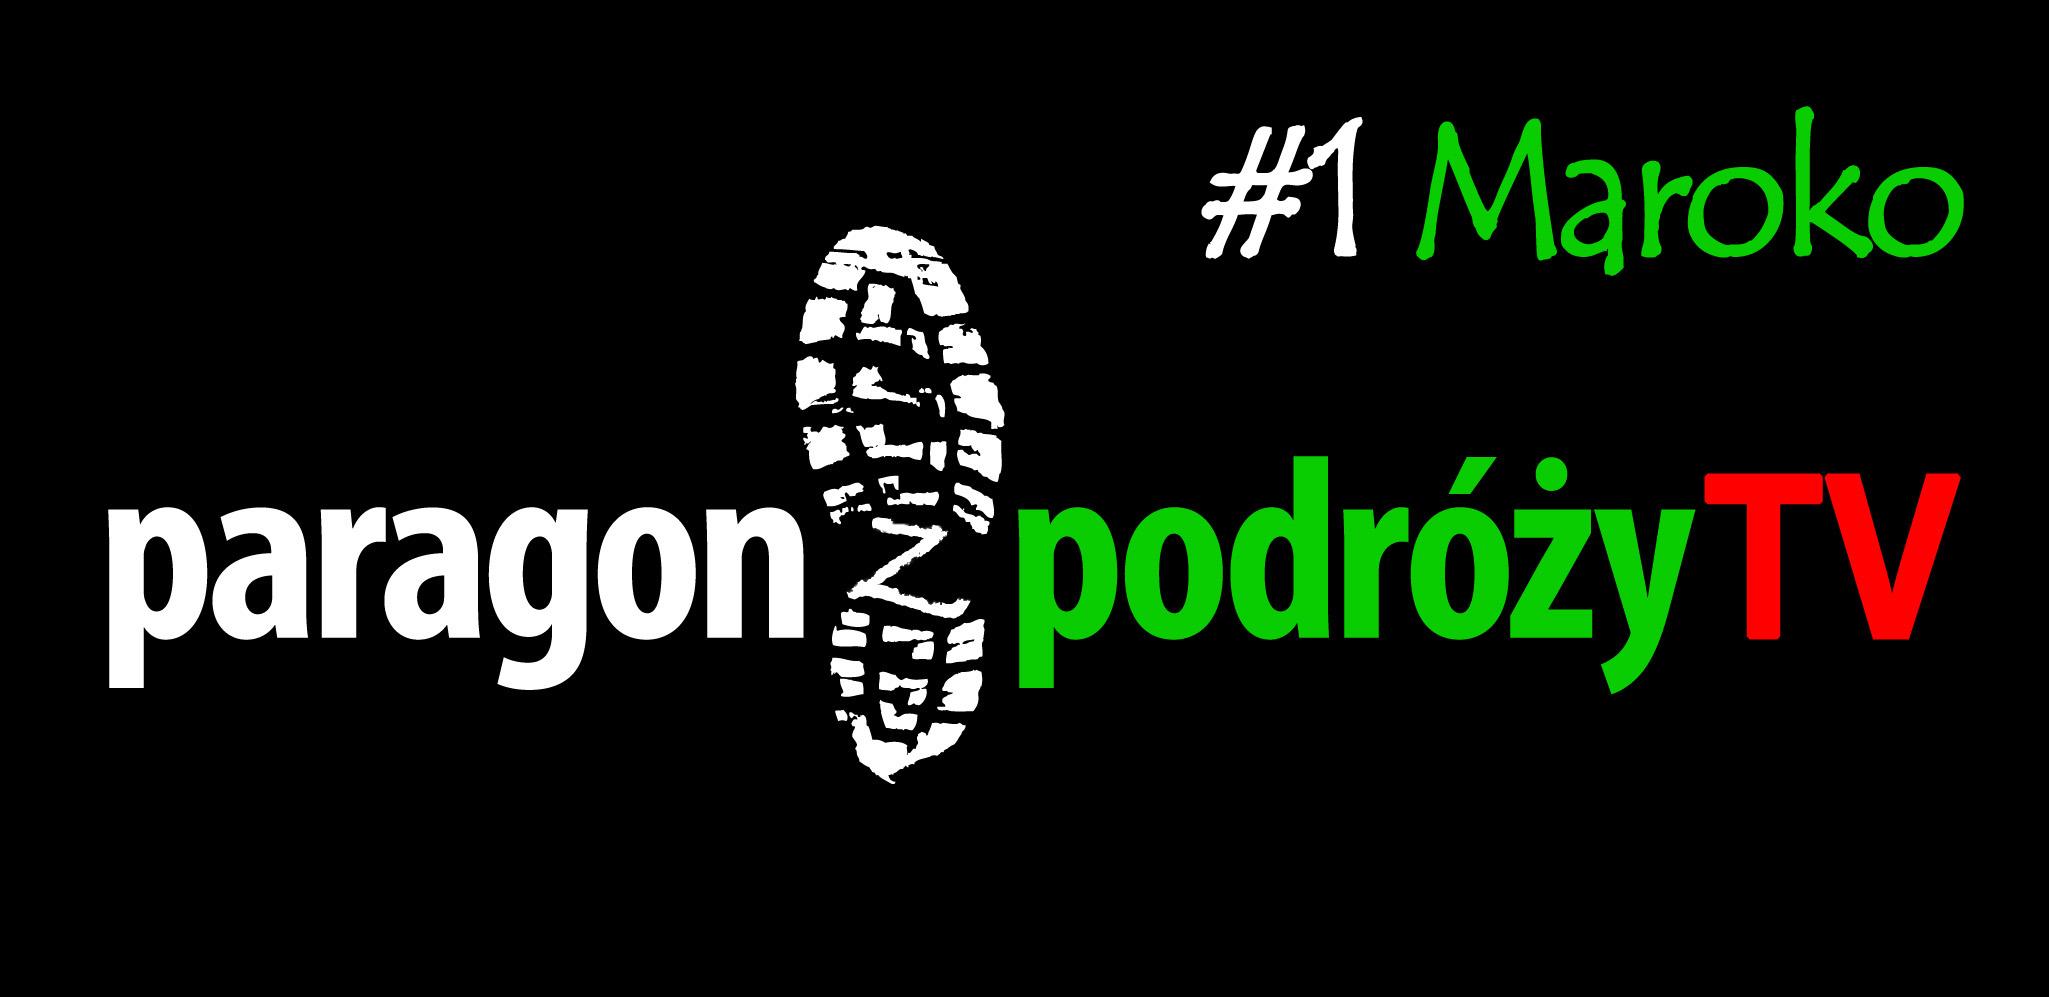 Paragon z podróży TV #1 – Maroko i plandeka